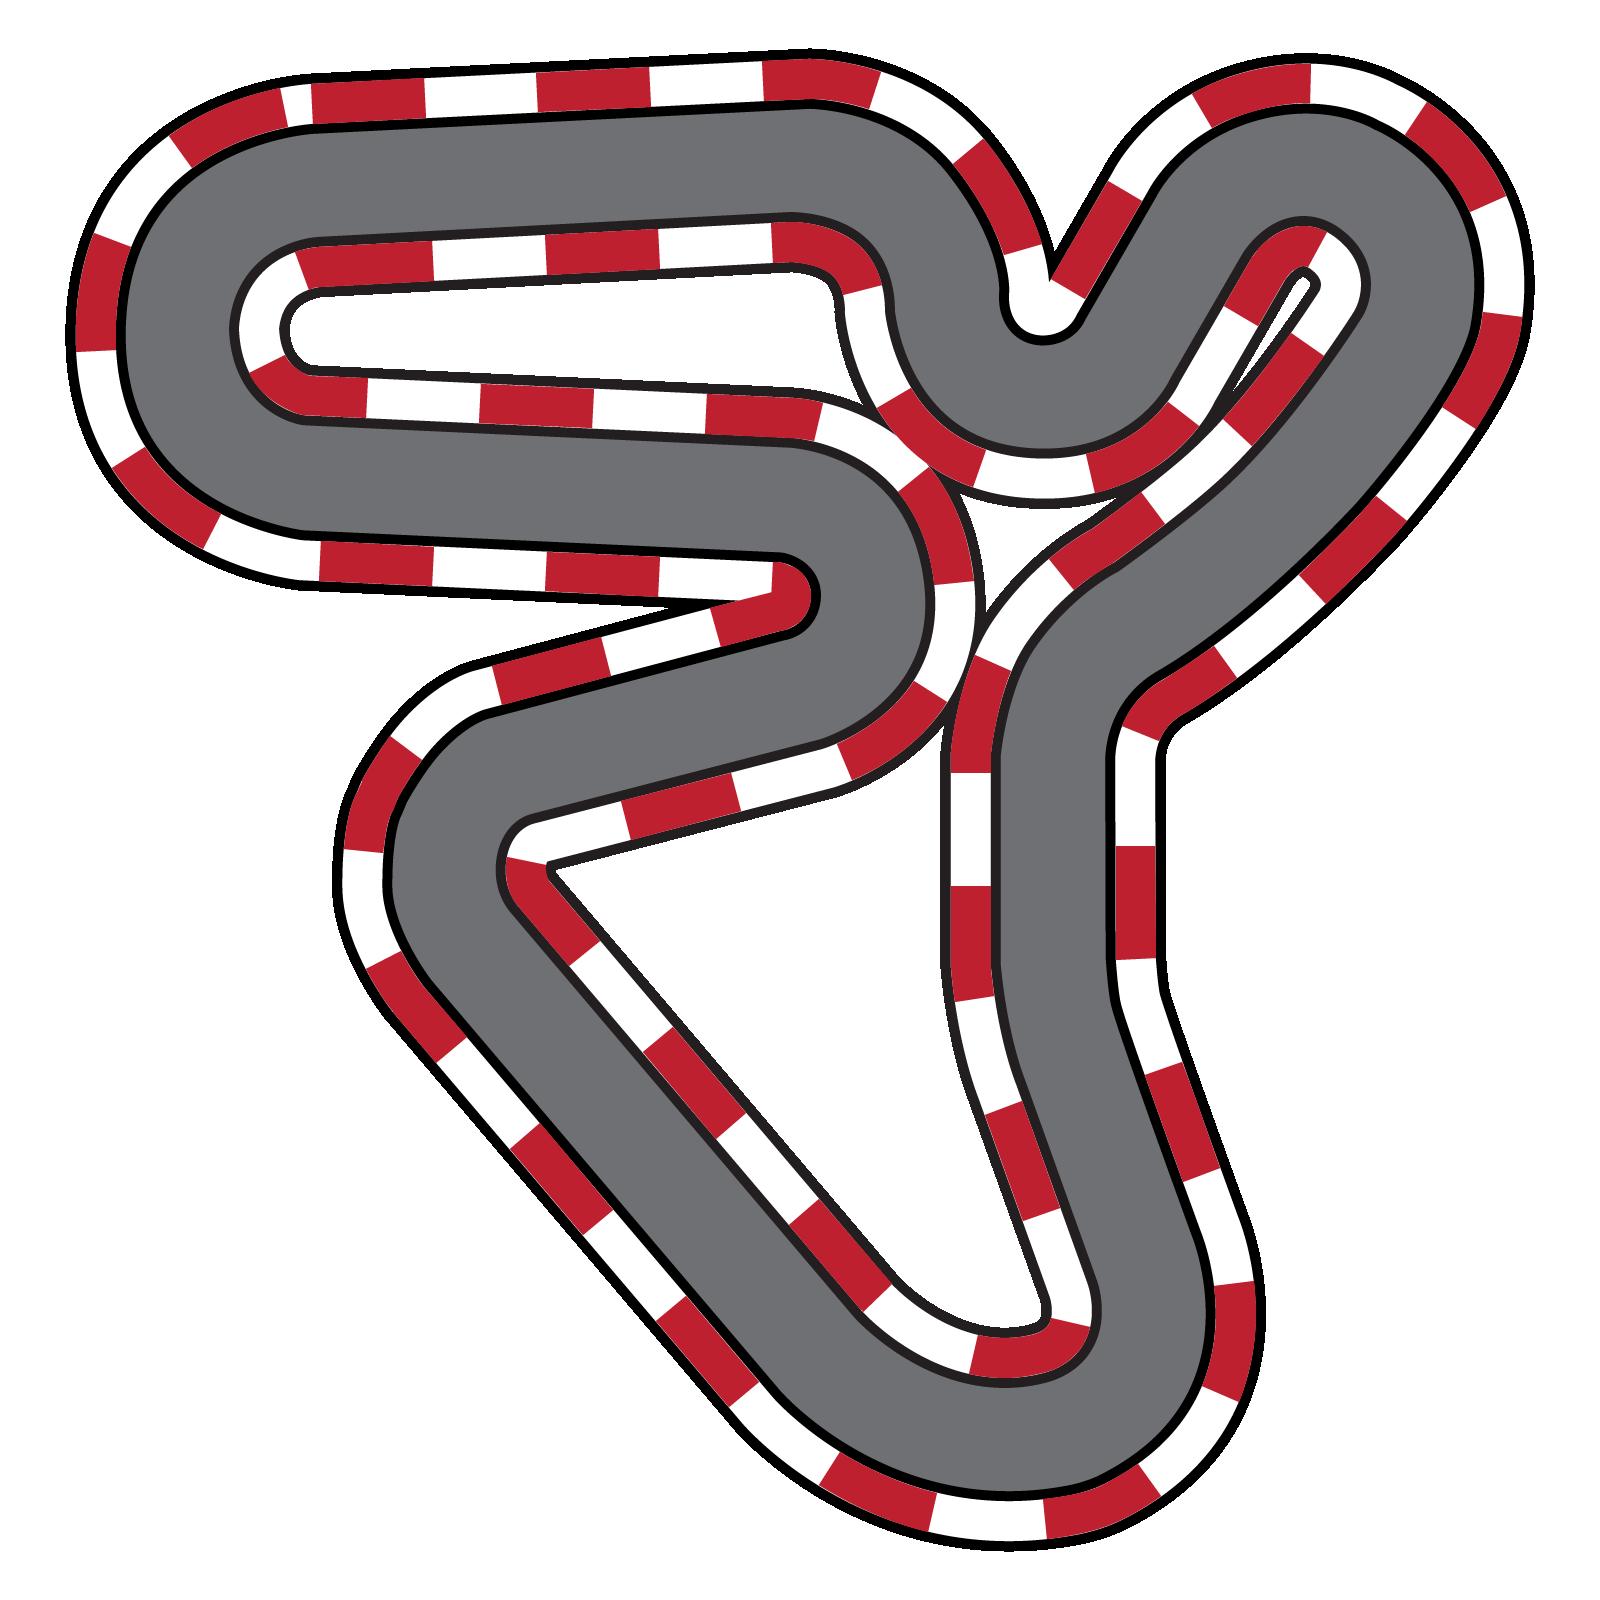 collection of car. Race clipart racecourse